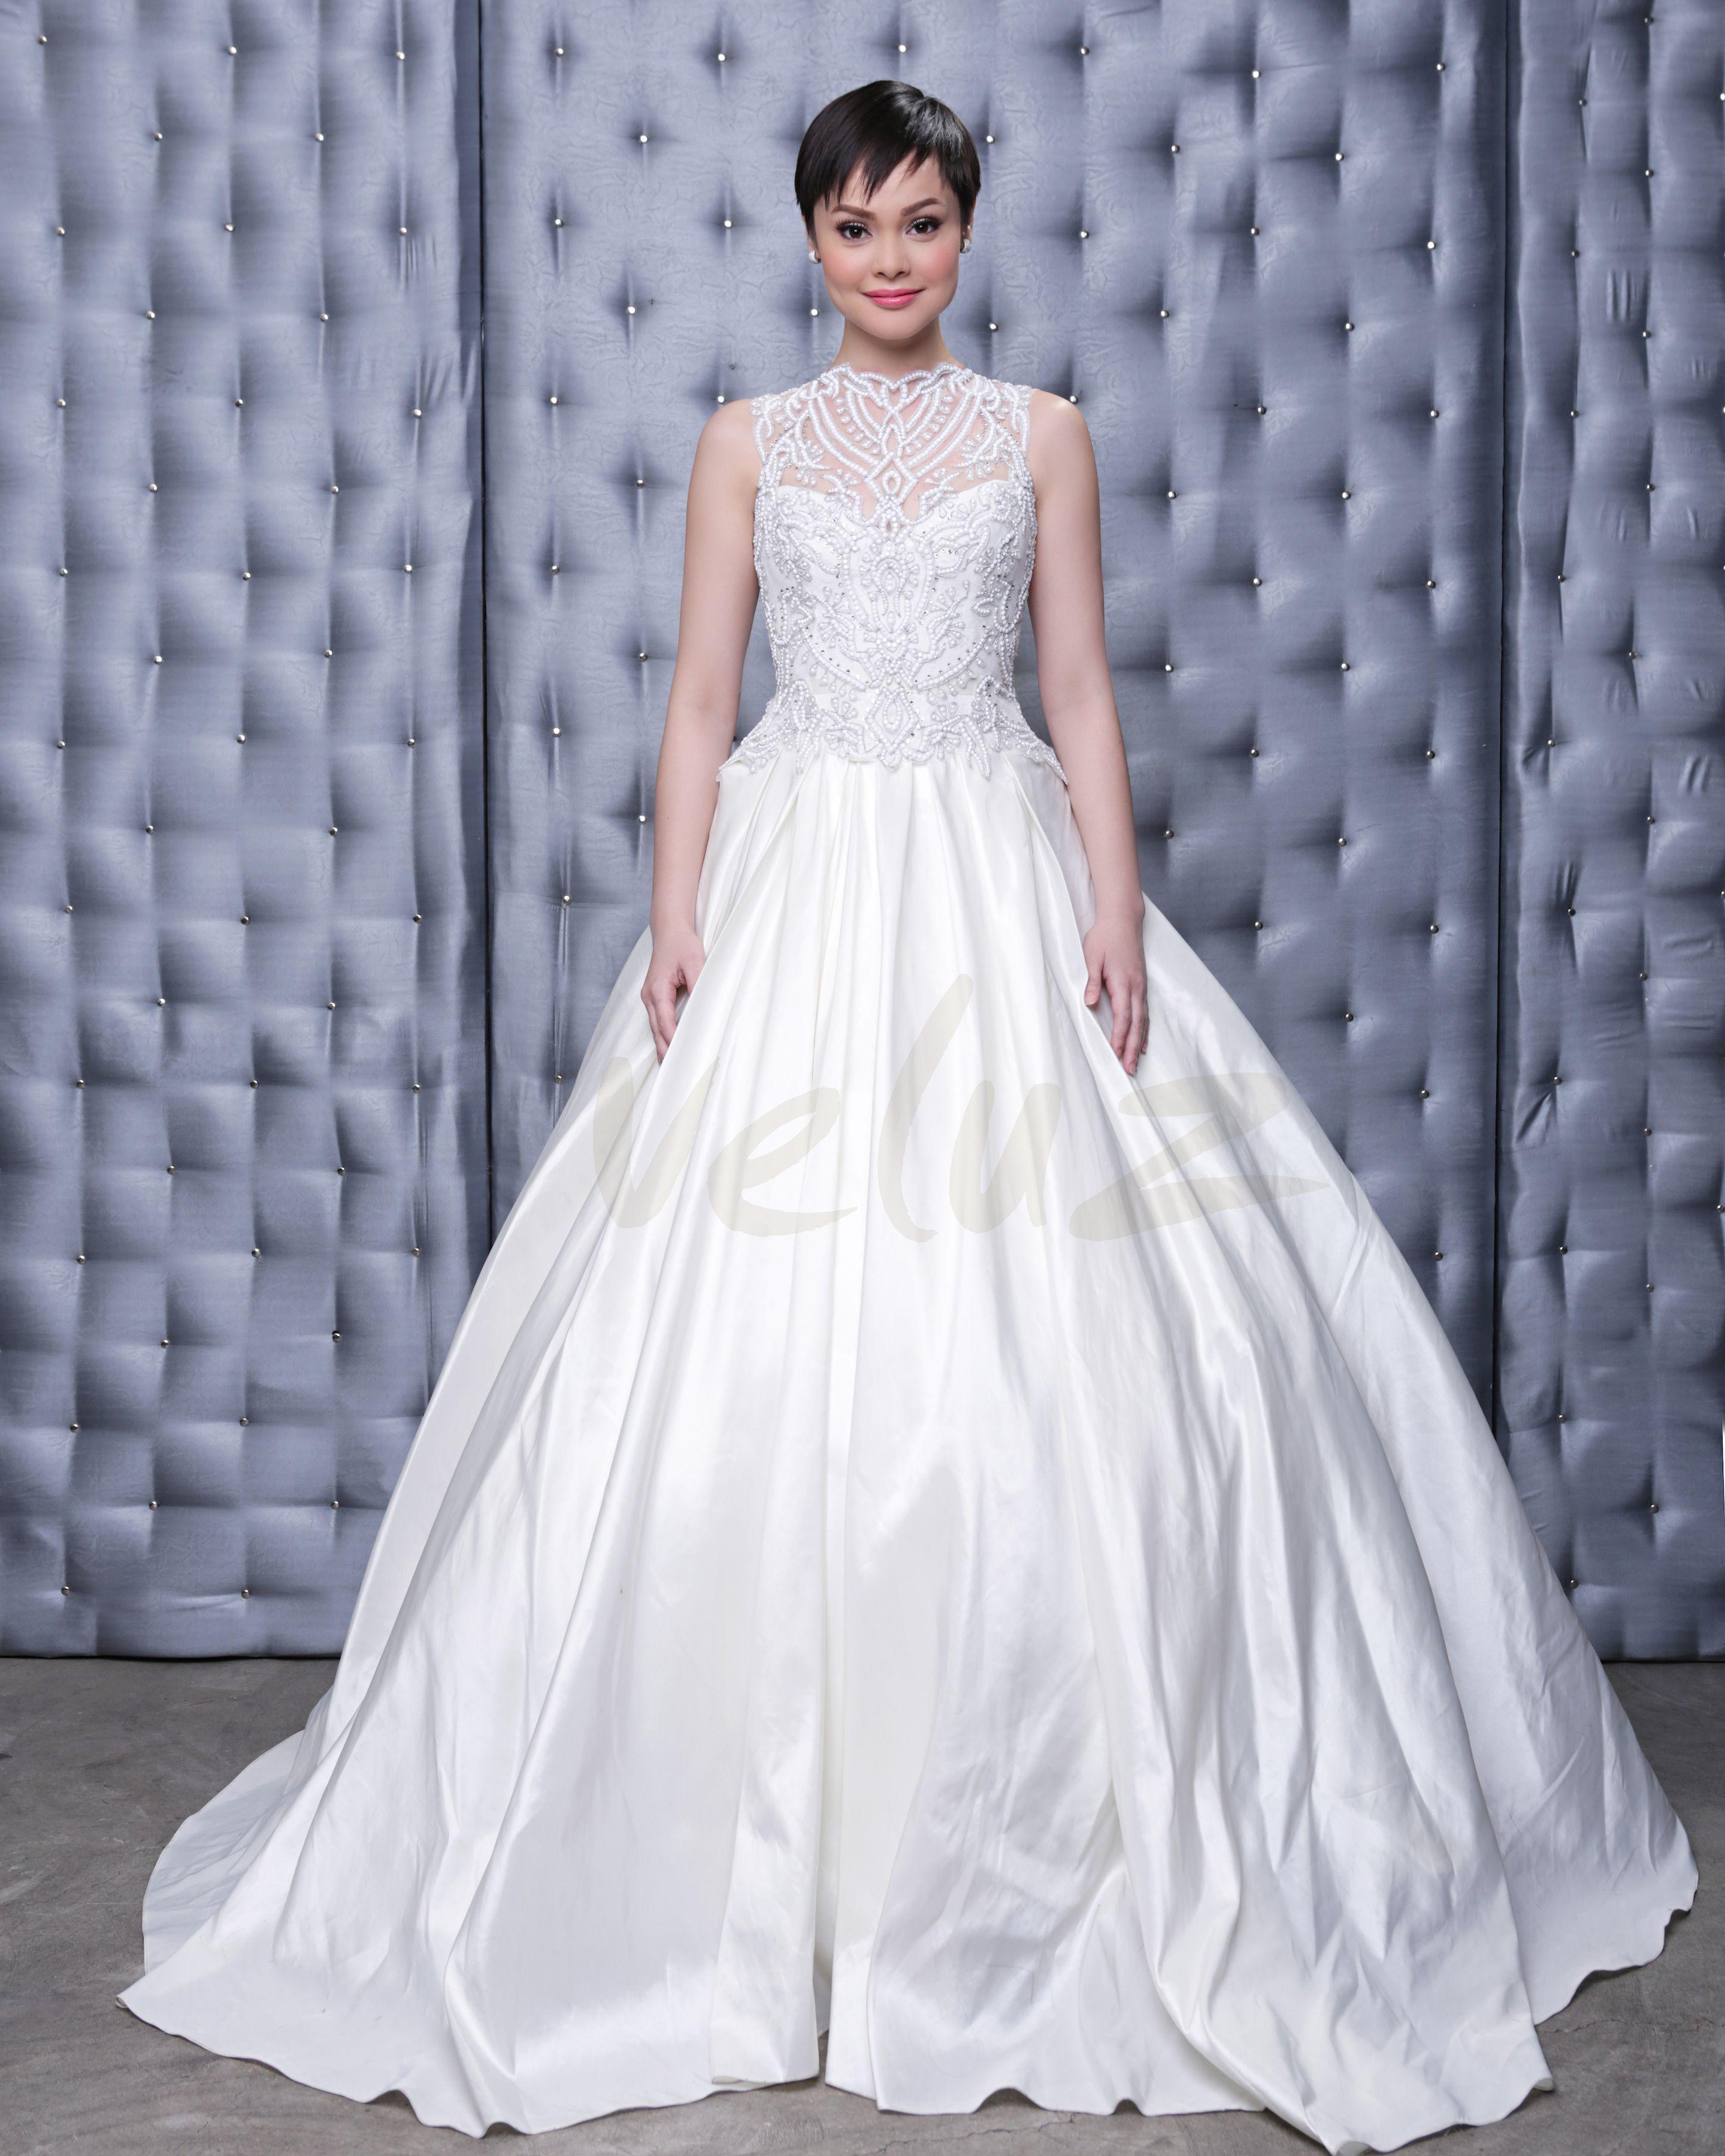 Bettina dress | Model: Caroline Ruegg | Veluz RTW 2014 | Pinterest